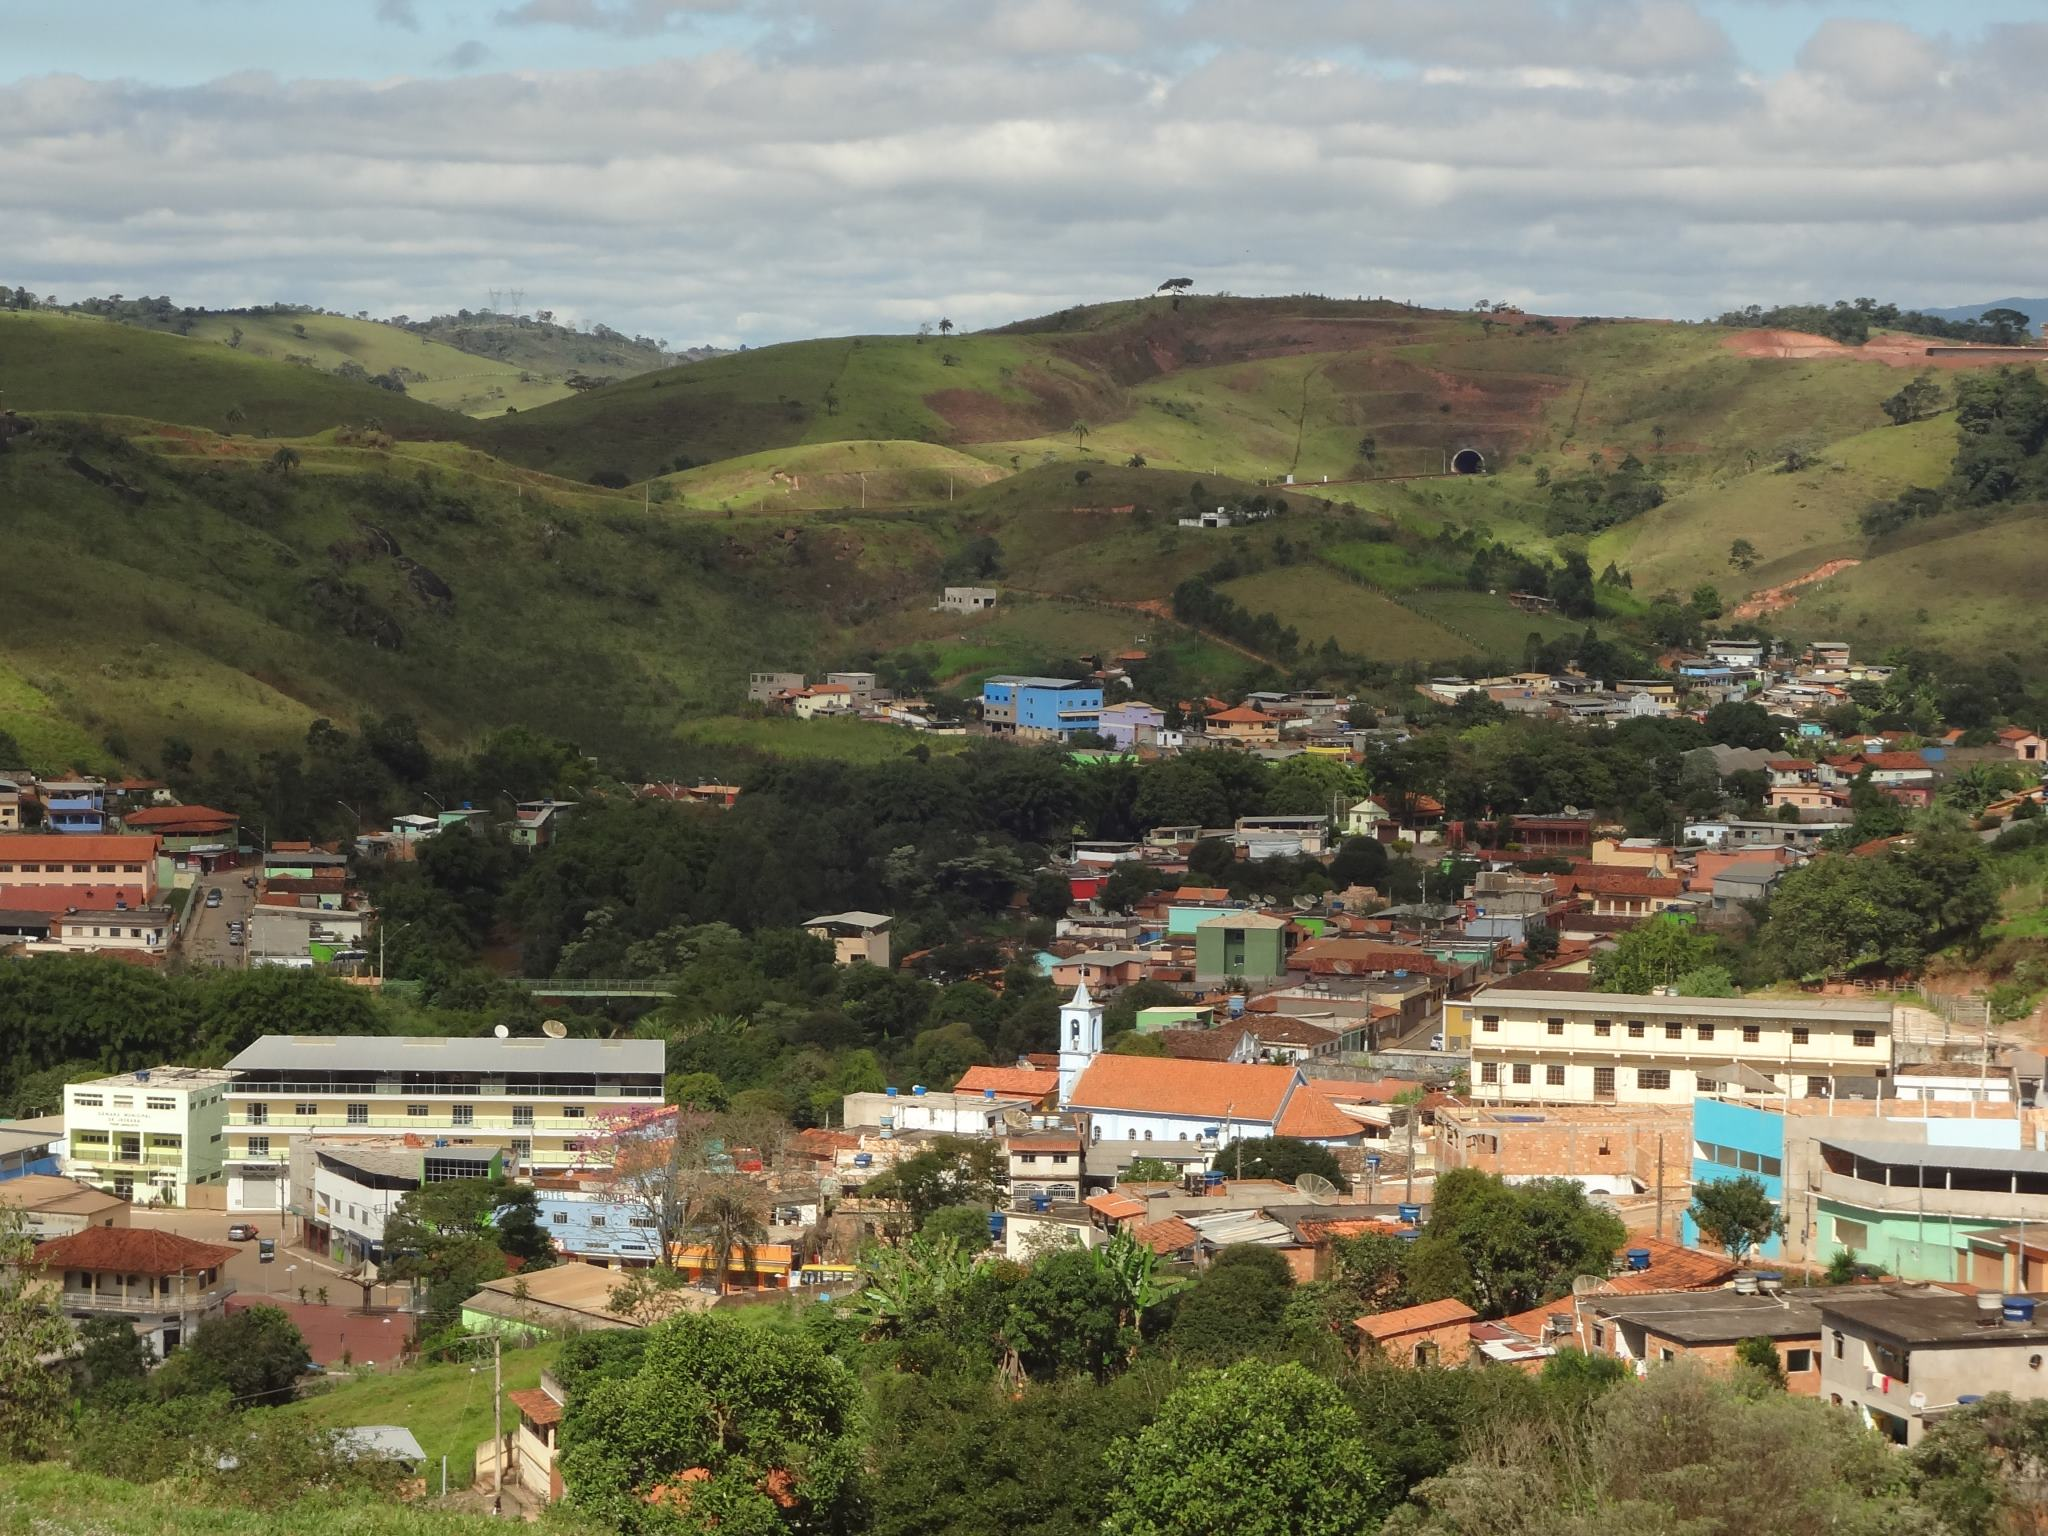 Jeceaba Minas Gerais fonte: upload.wikimedia.org